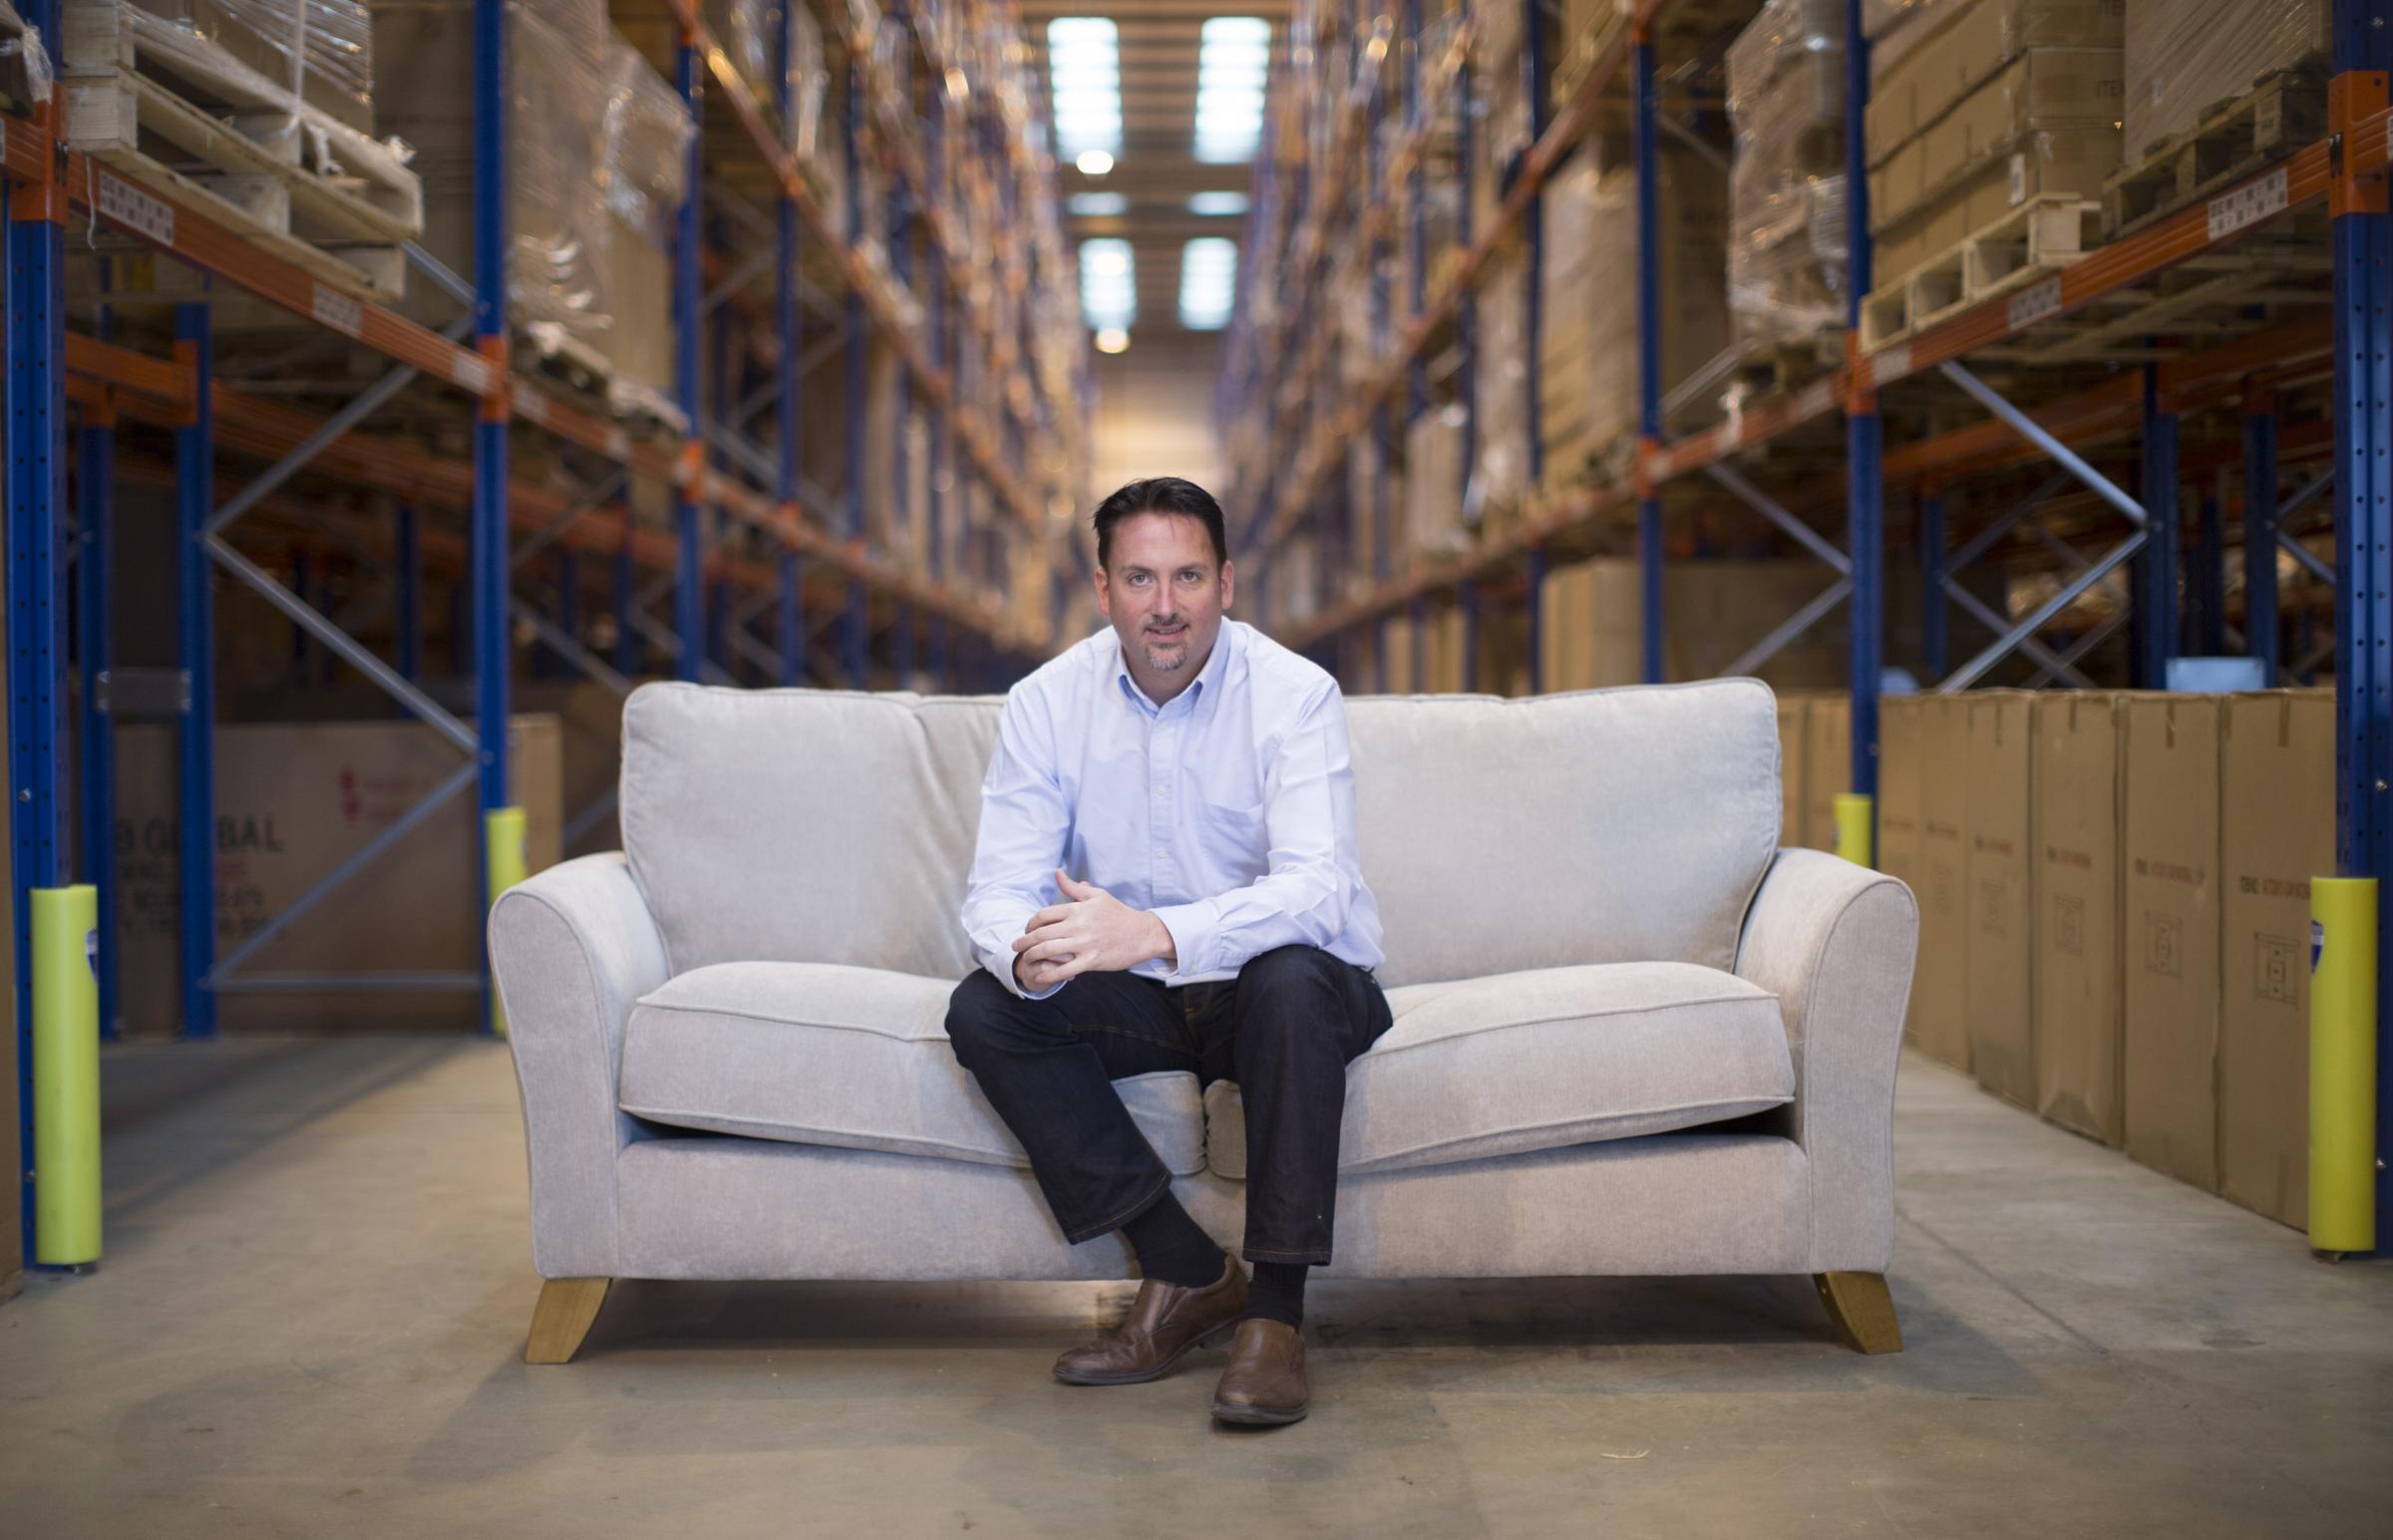 REVEALED: Inside Story Of Retail Mogul Behind Oak Furniture Land